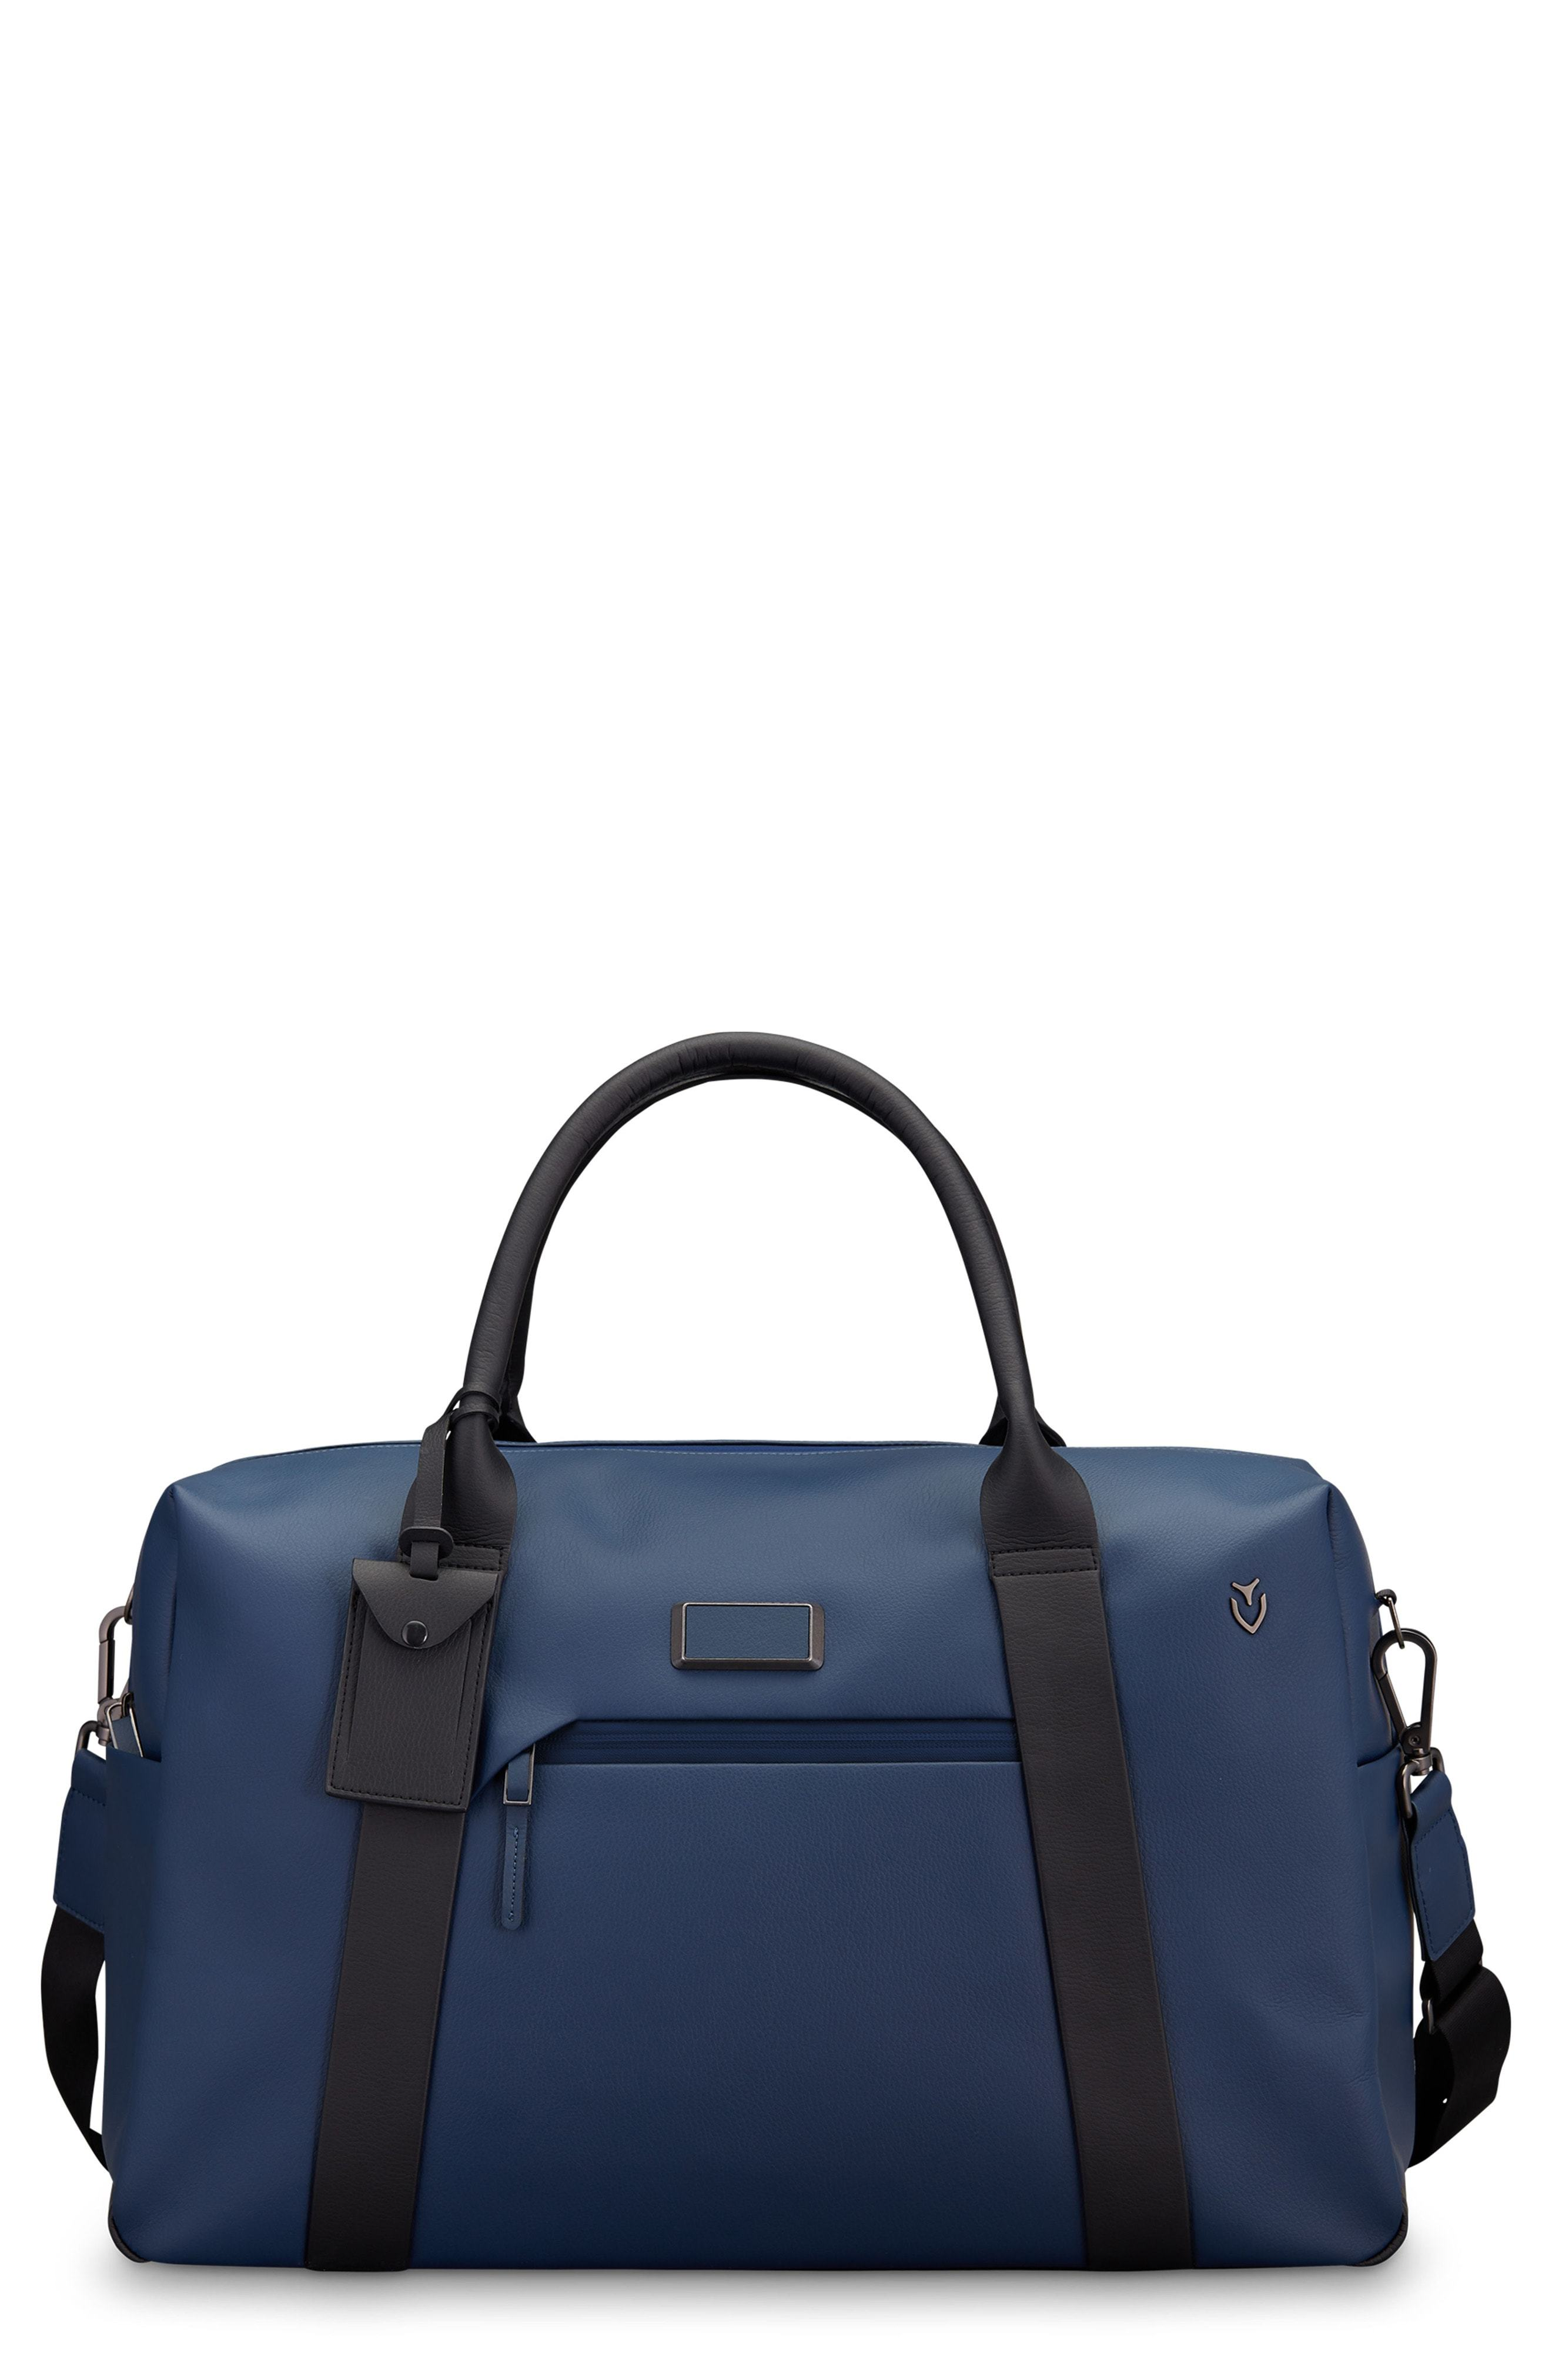 7638d575bda9 Vessel Signature 20 Faux Leather Duffel Bag, $245 | Nordstrom ...